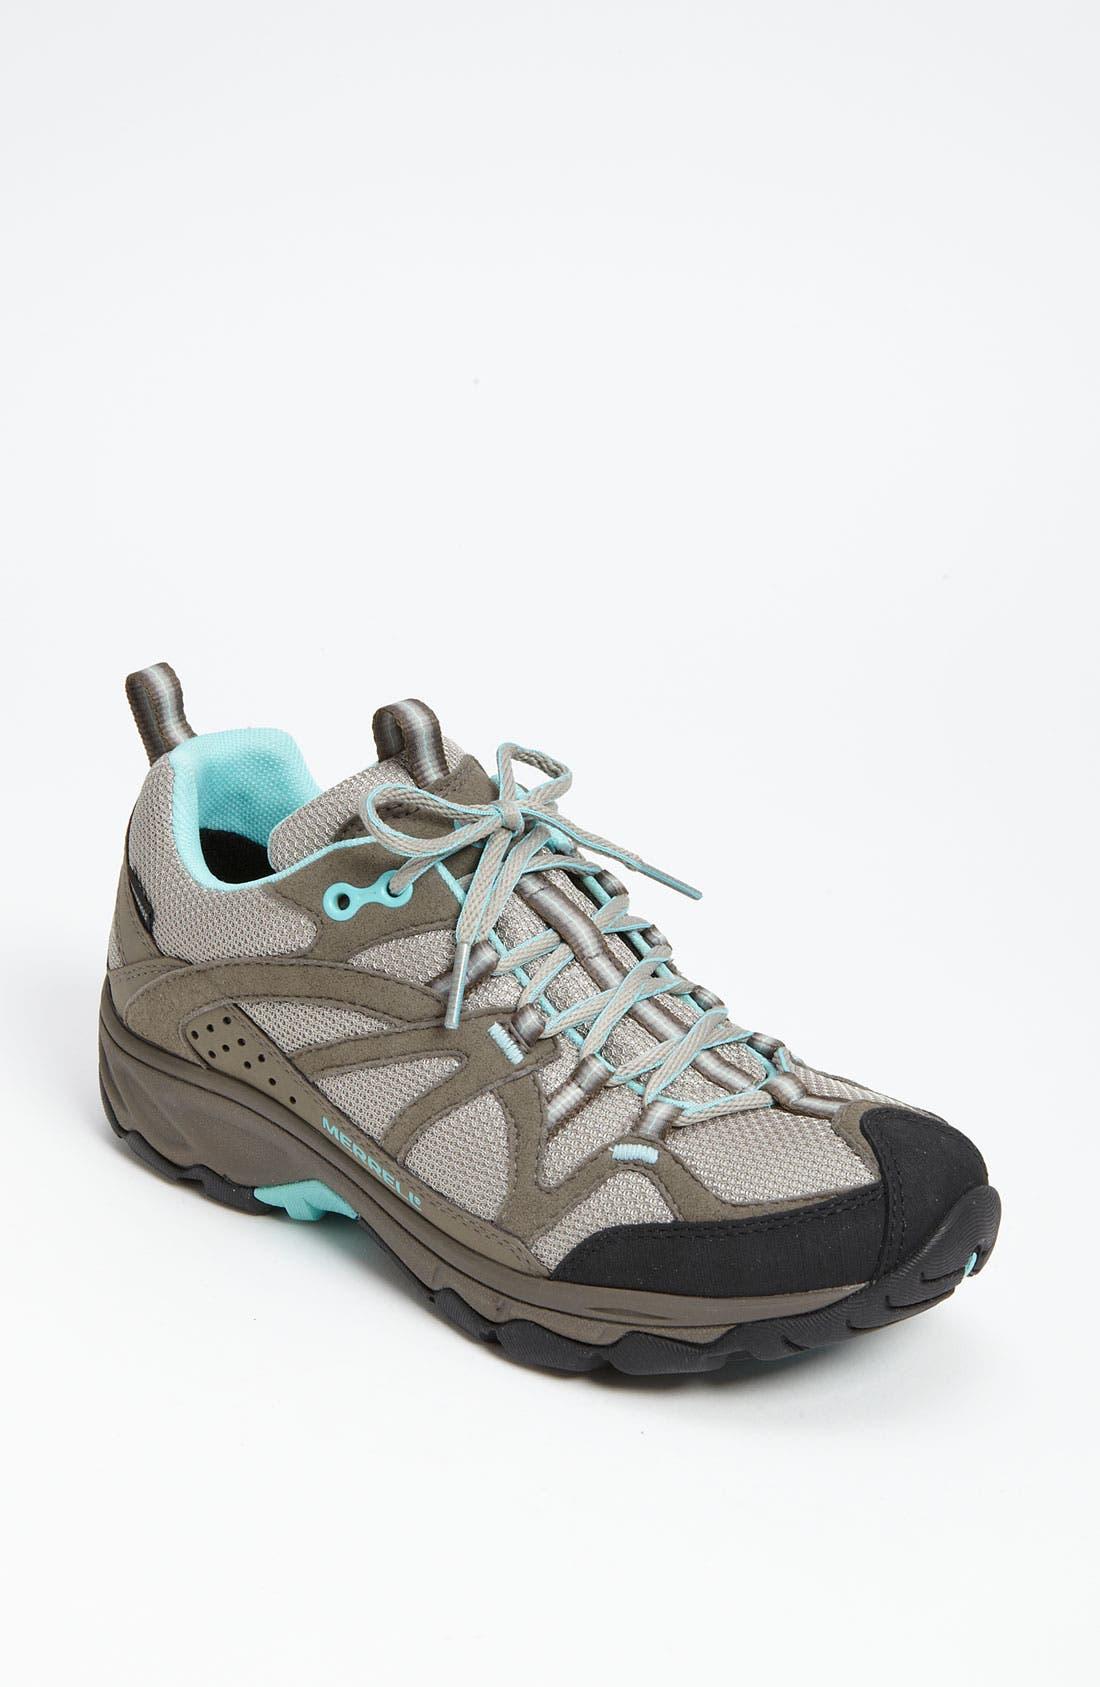 Main Image - Merrell 'Calia Waterproof' Hiking Shoe (Women)